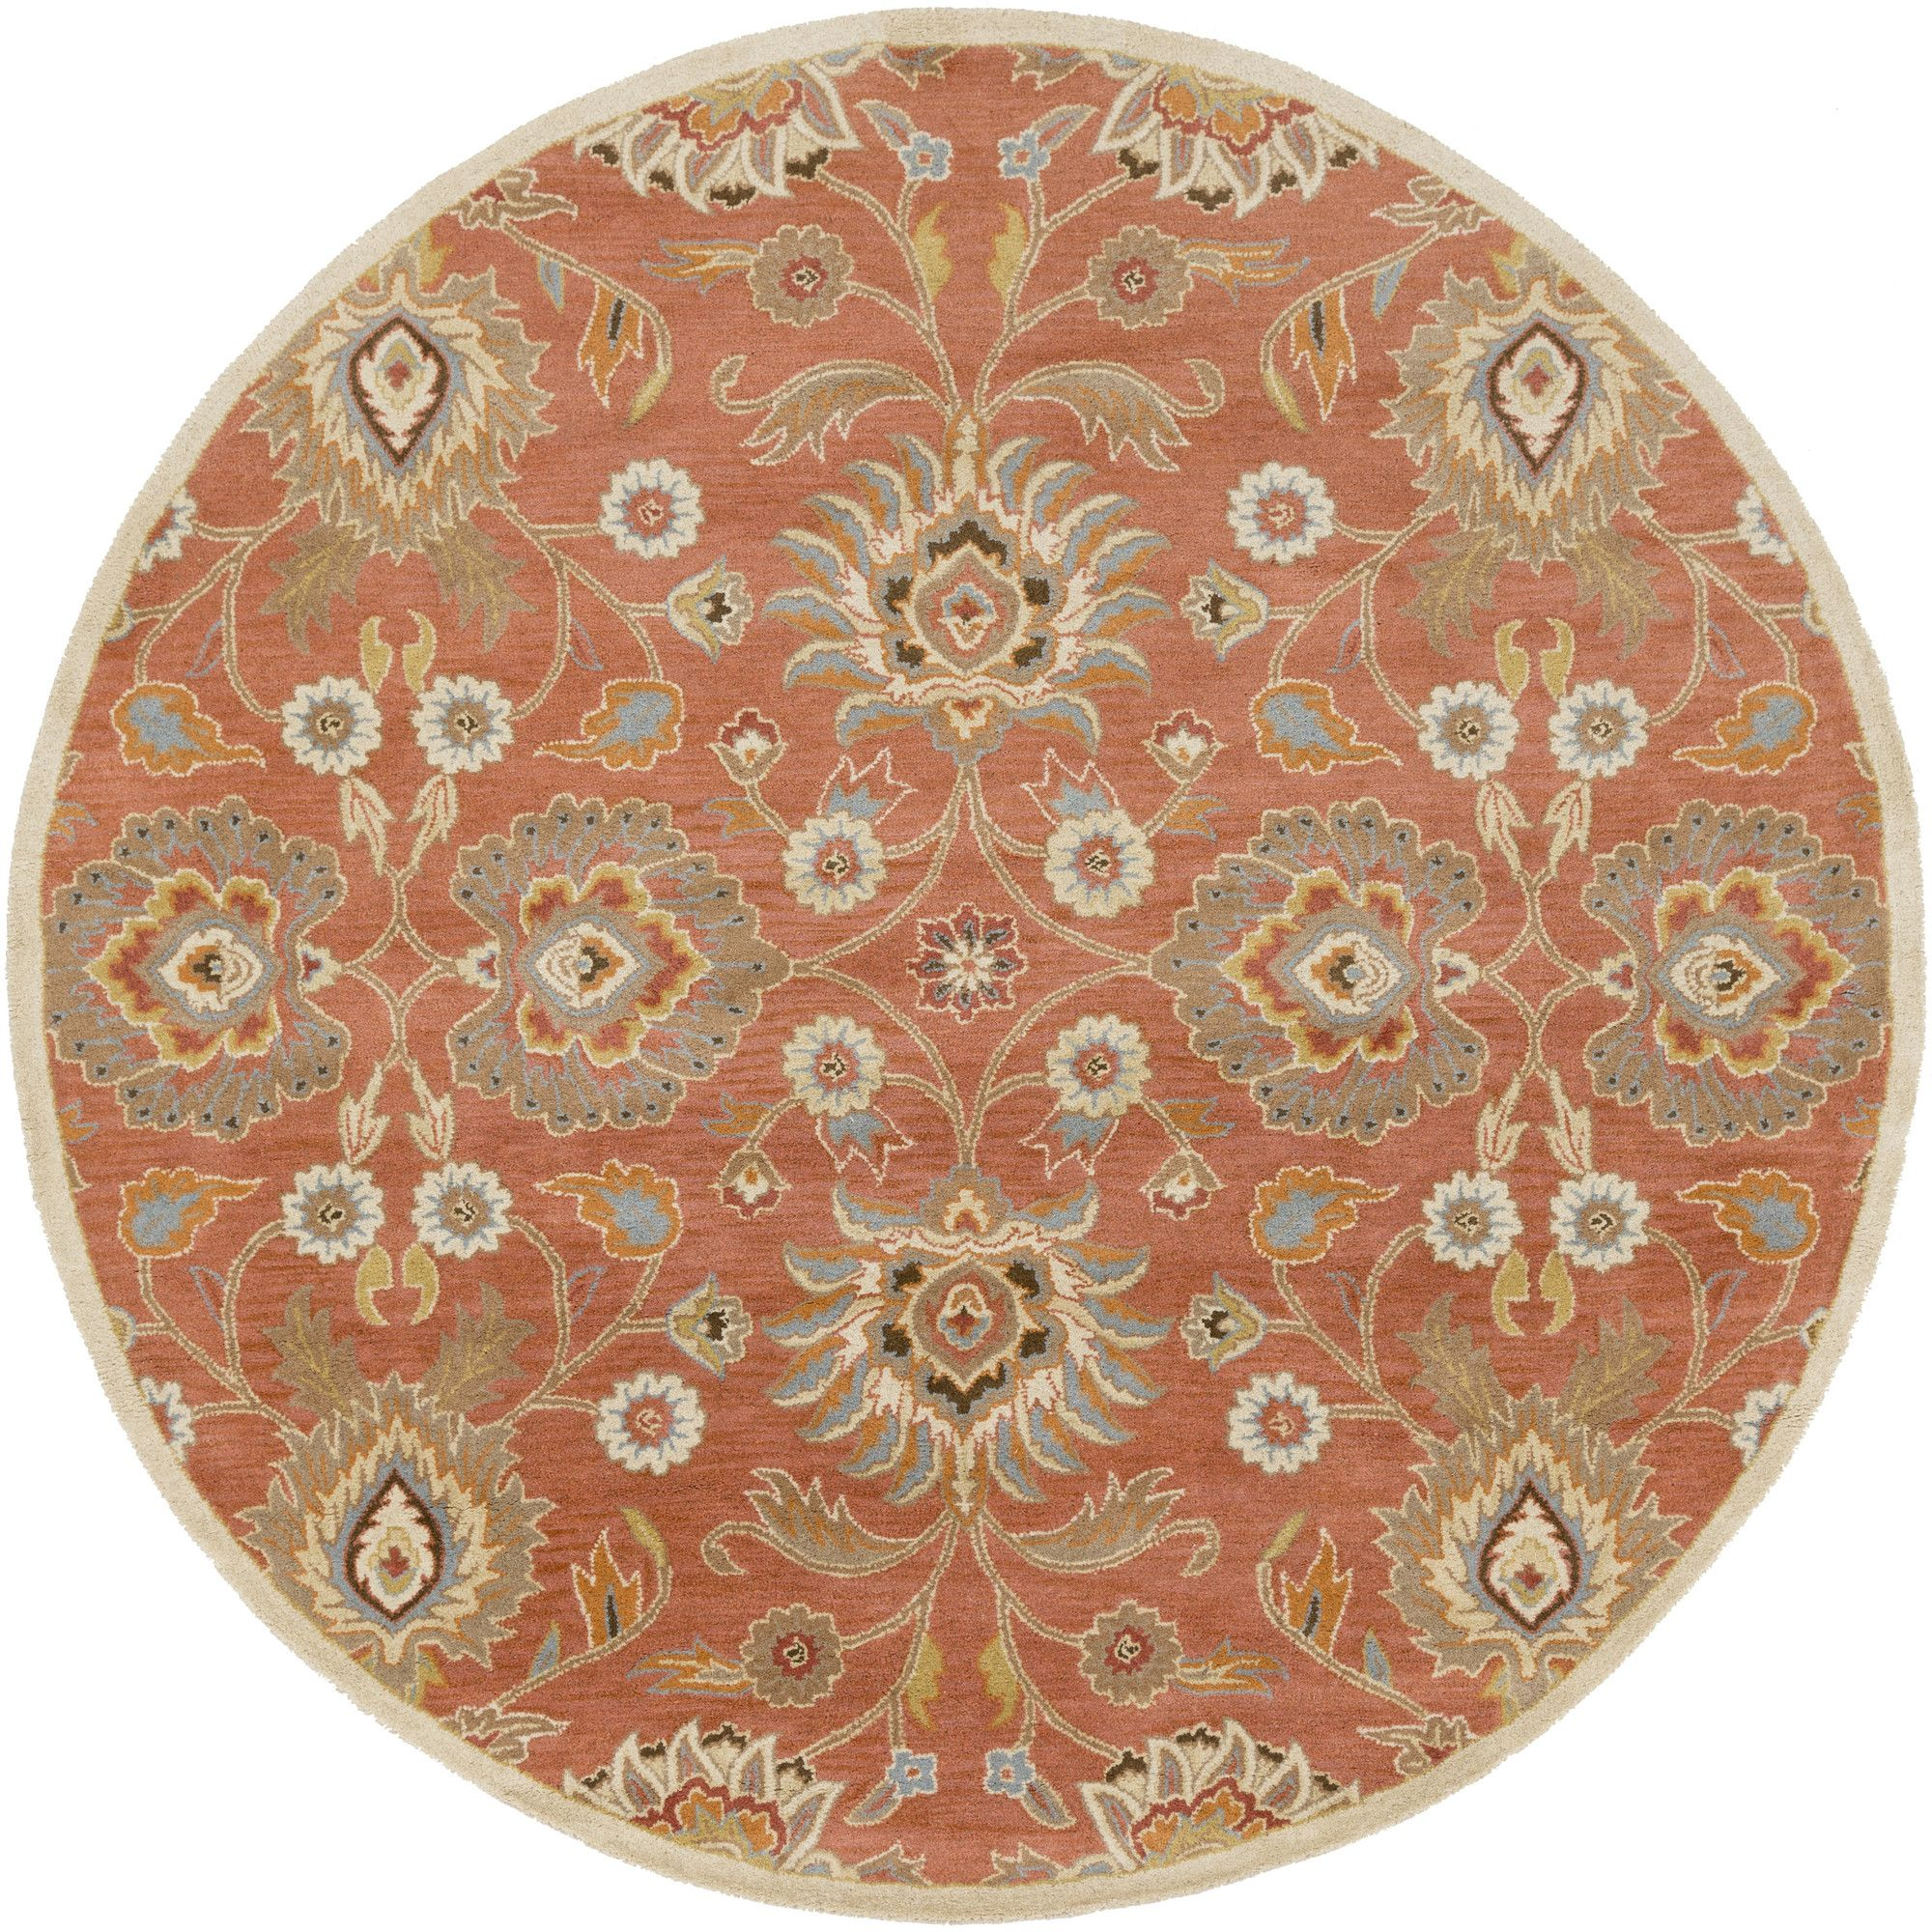 Topaz handtufted burnt orange area rug orange area rug oriental